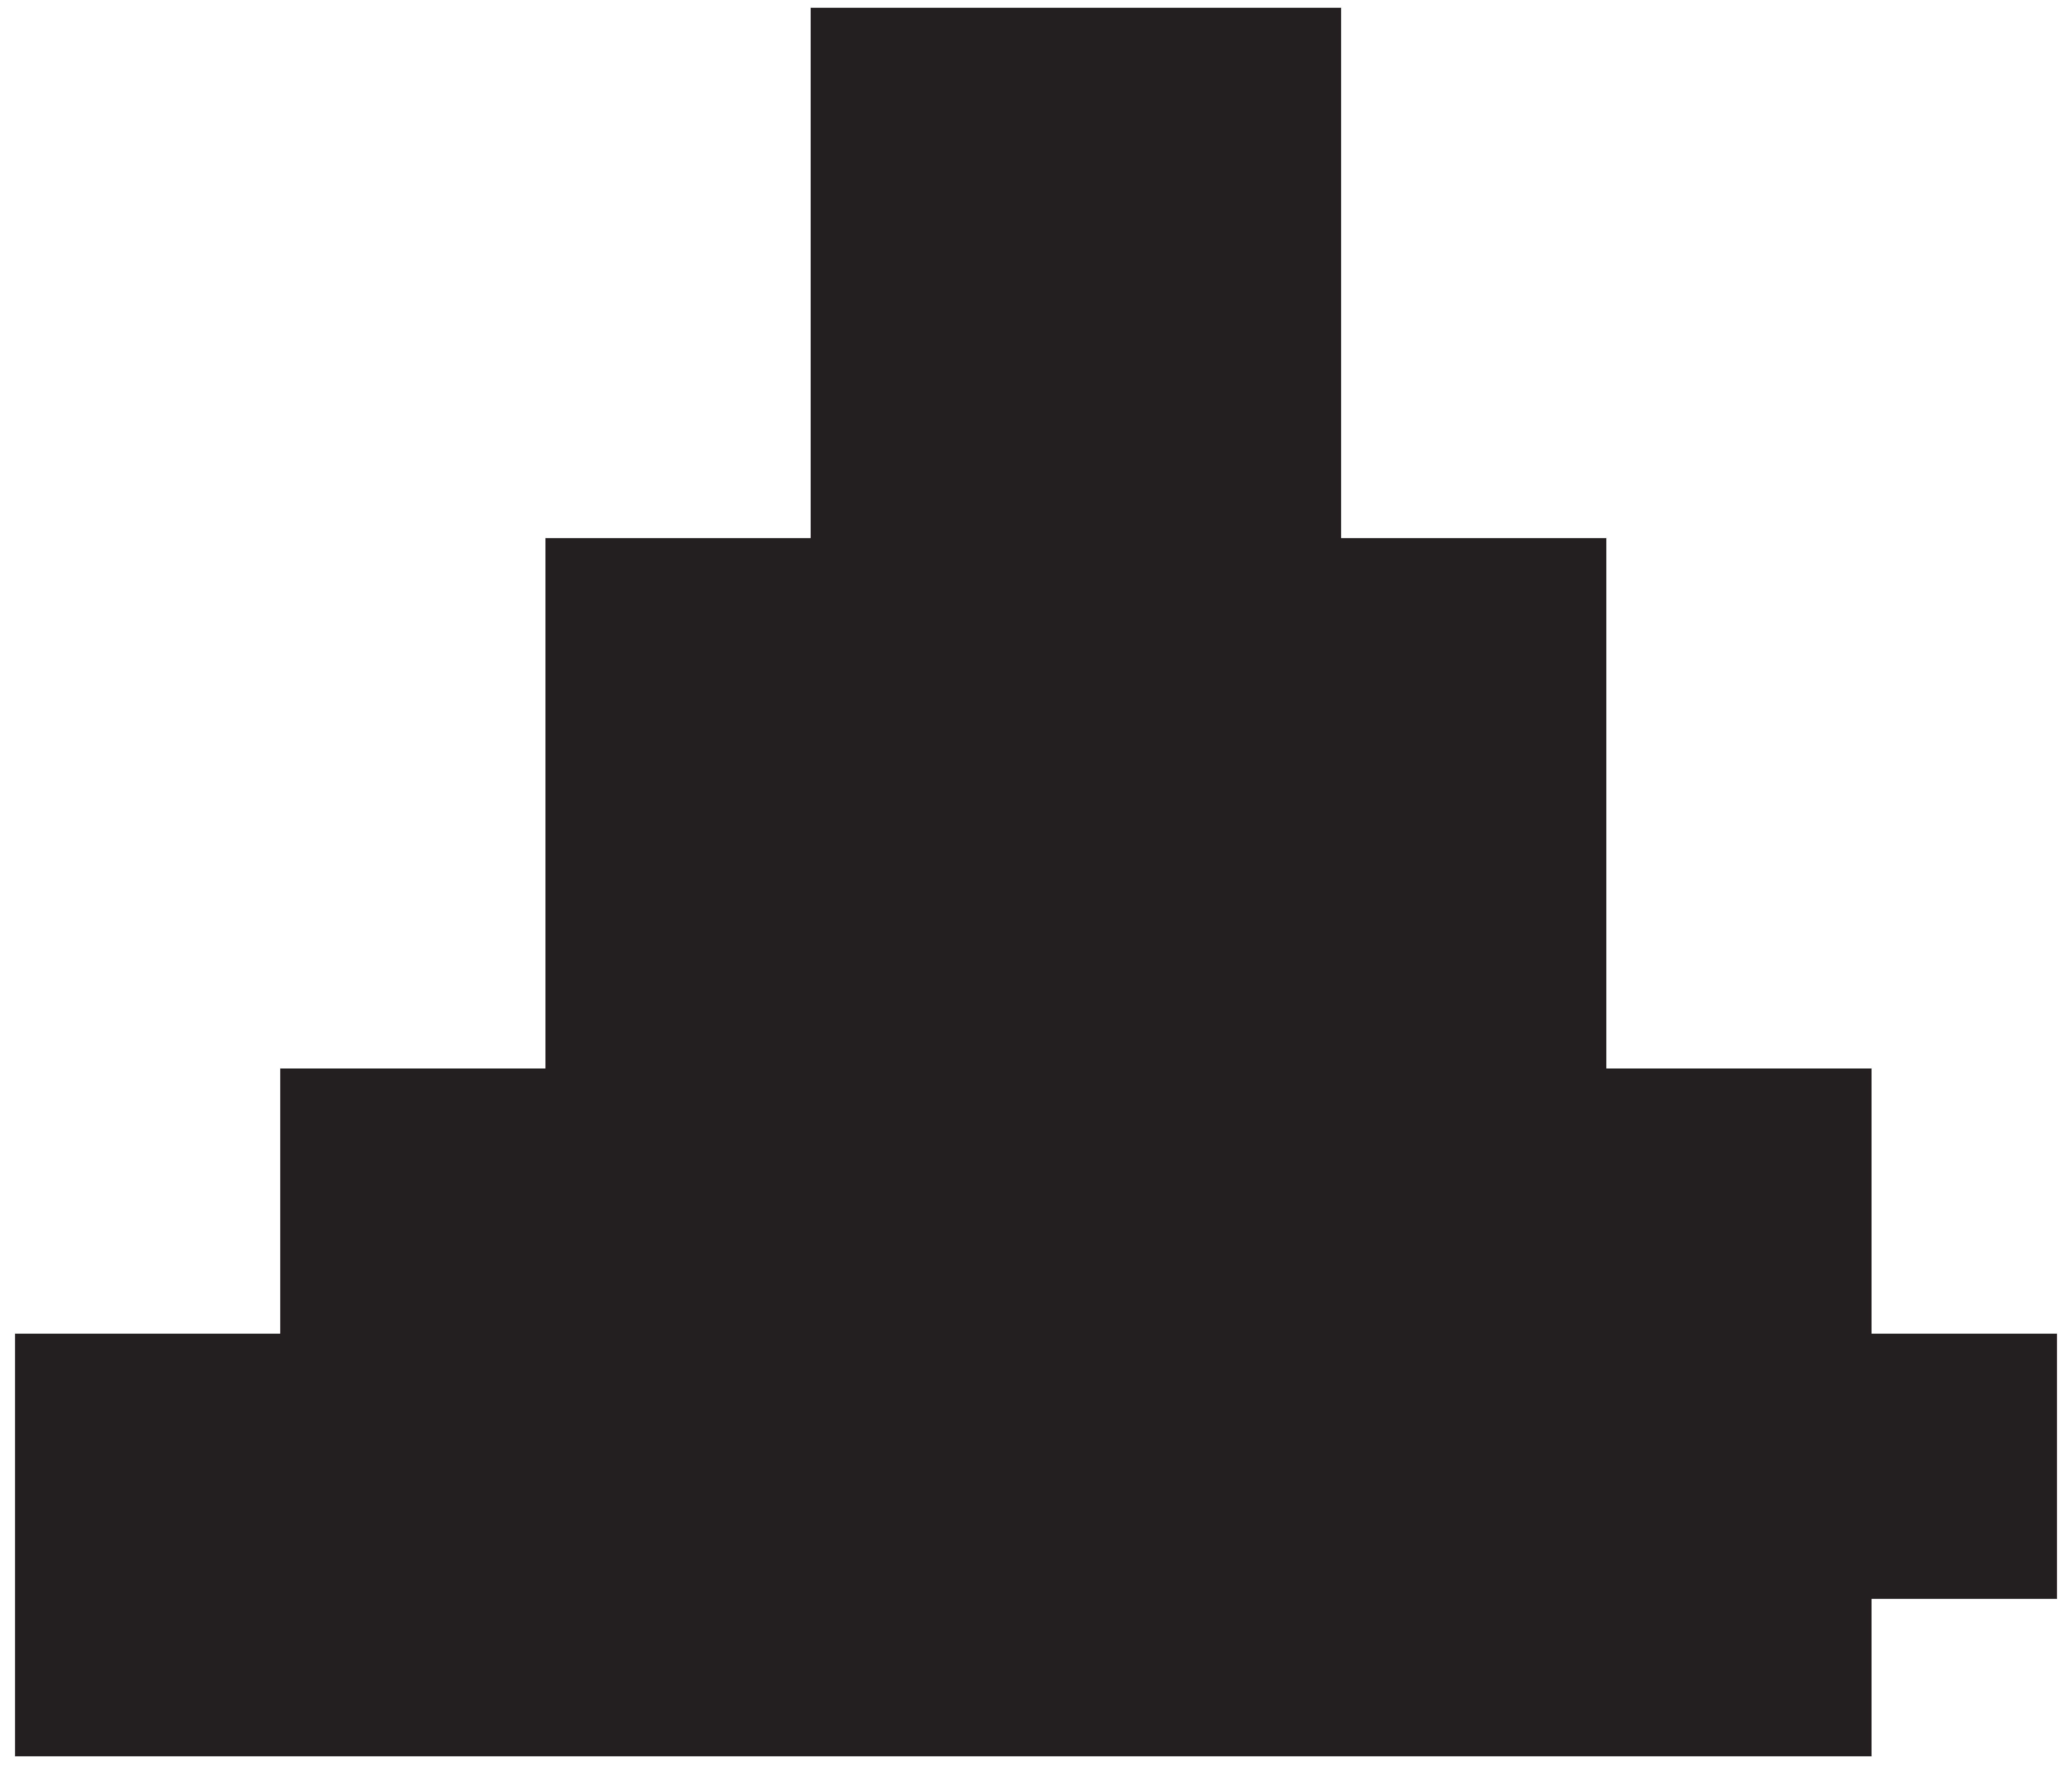 Buddhist meditation Buddhism Lotus position Clip art.